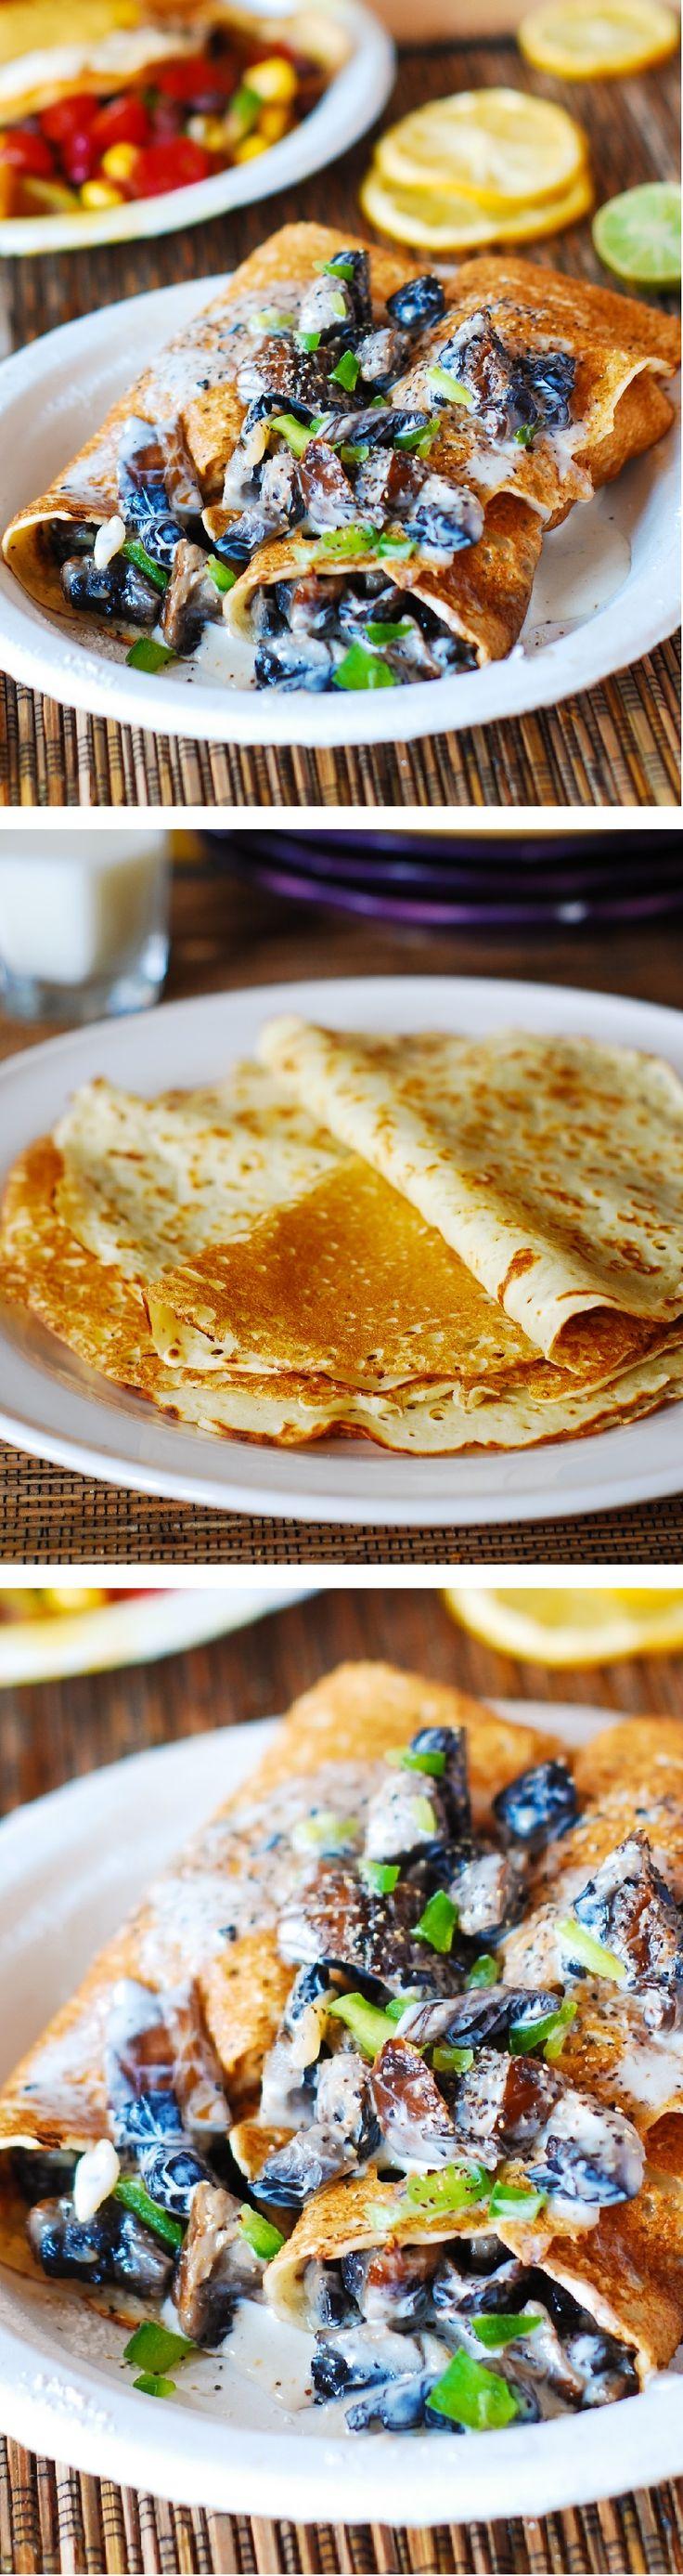 Tasty Crepe mix recipes on Pinterest